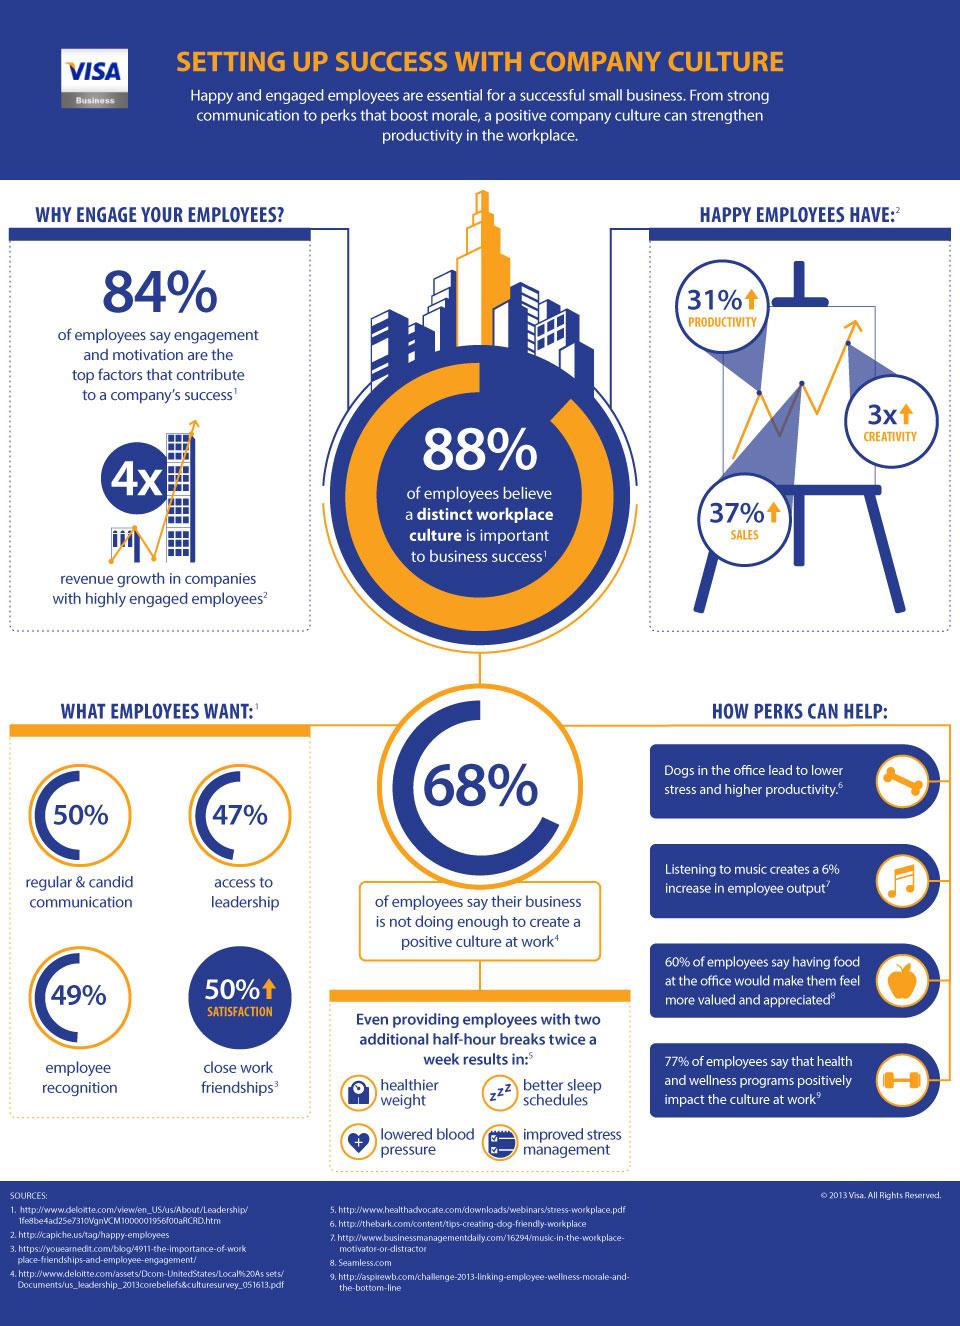 Visa-Corporate-Culture-Infographic